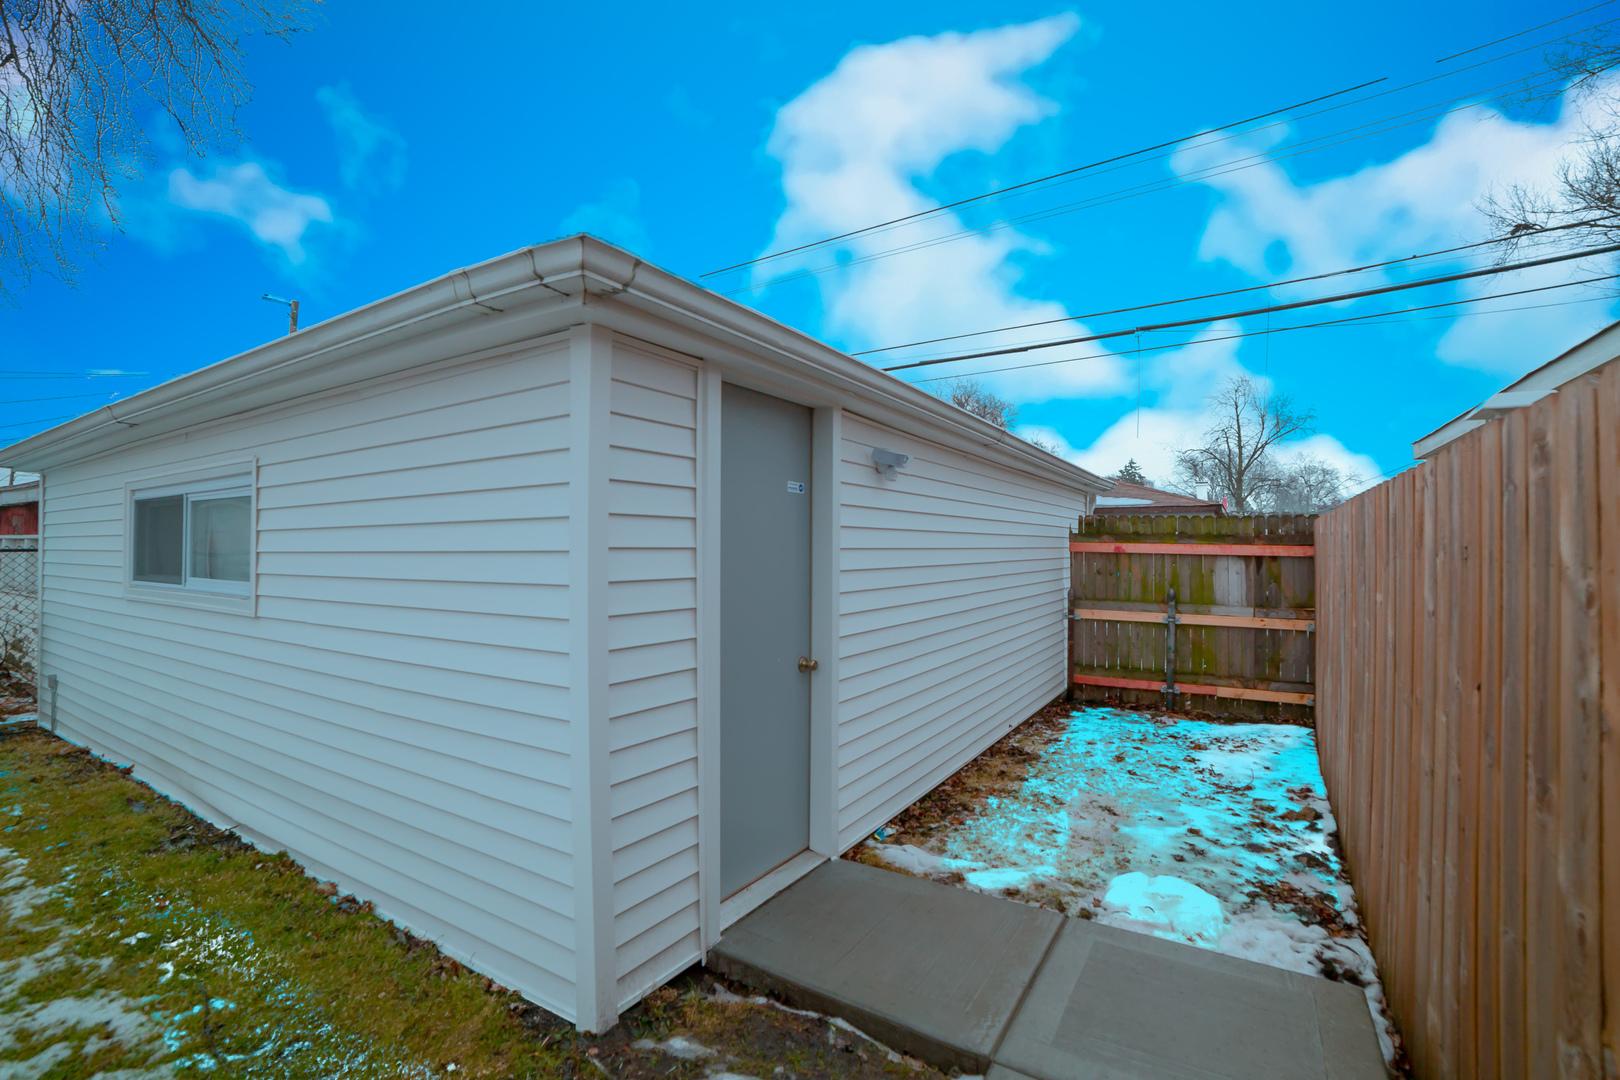 12631 South justine, Calumet Park, Illinois, 60827